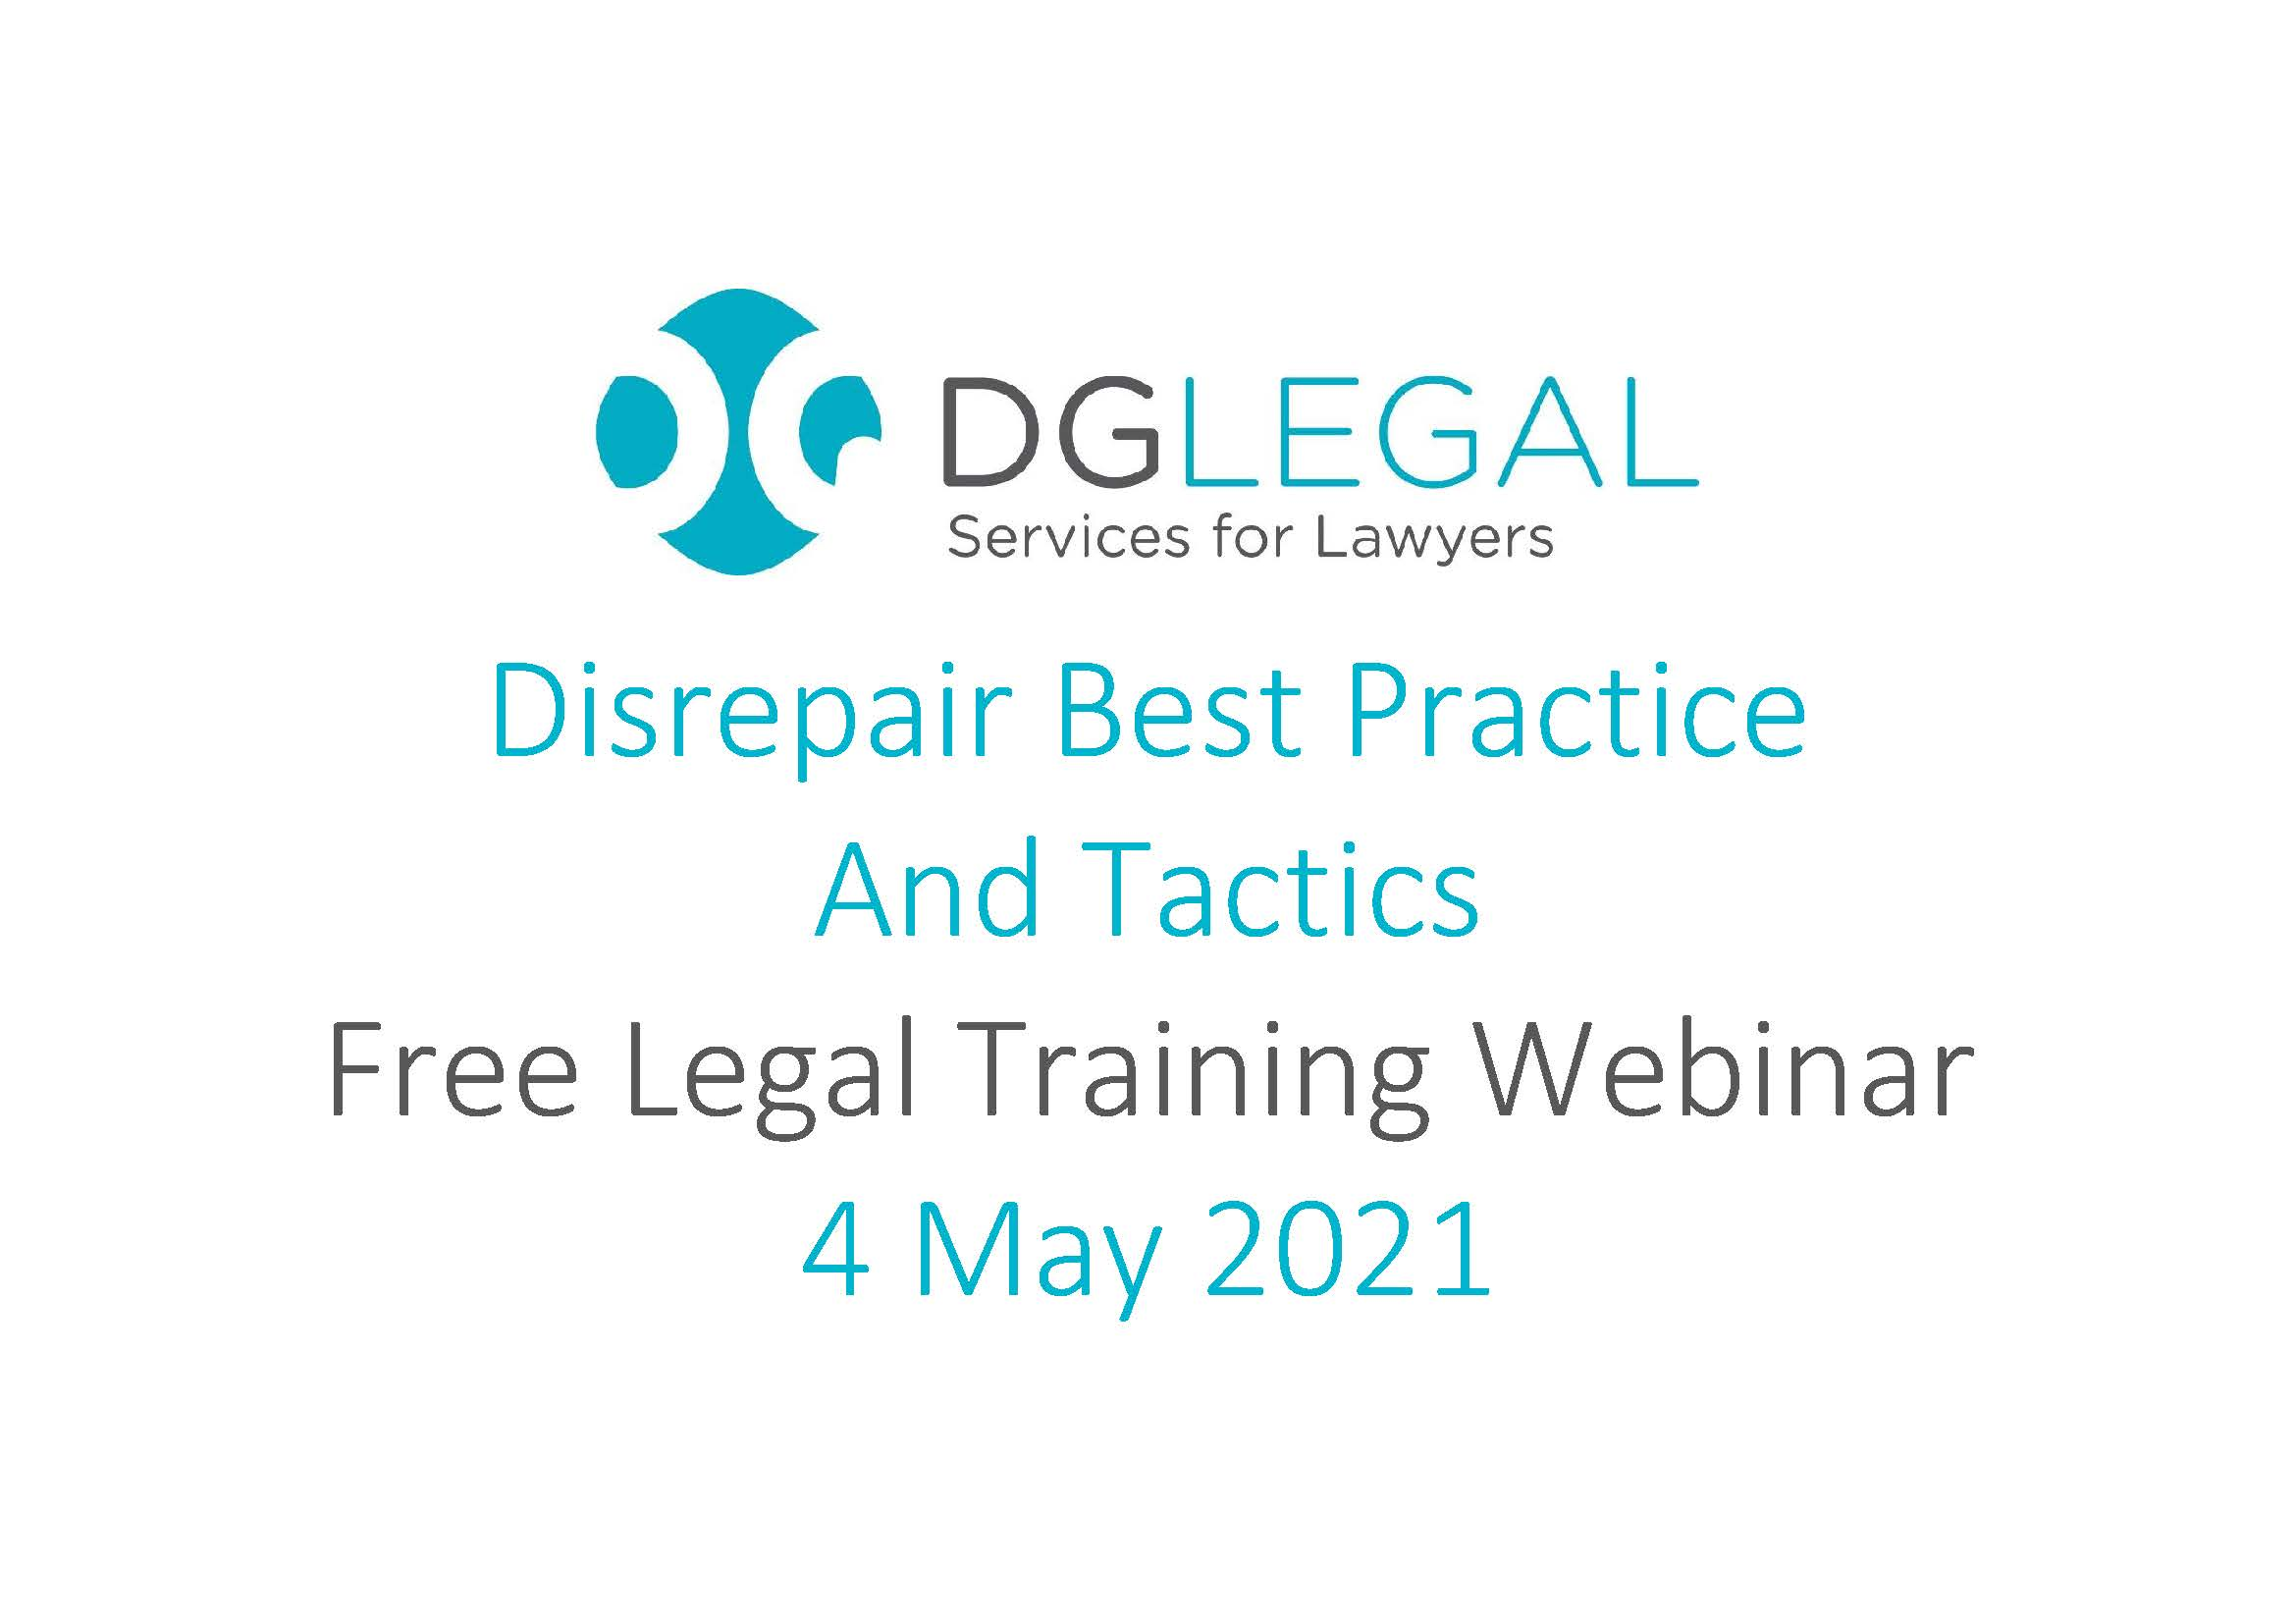 Disrepair Best Practice And Tactics